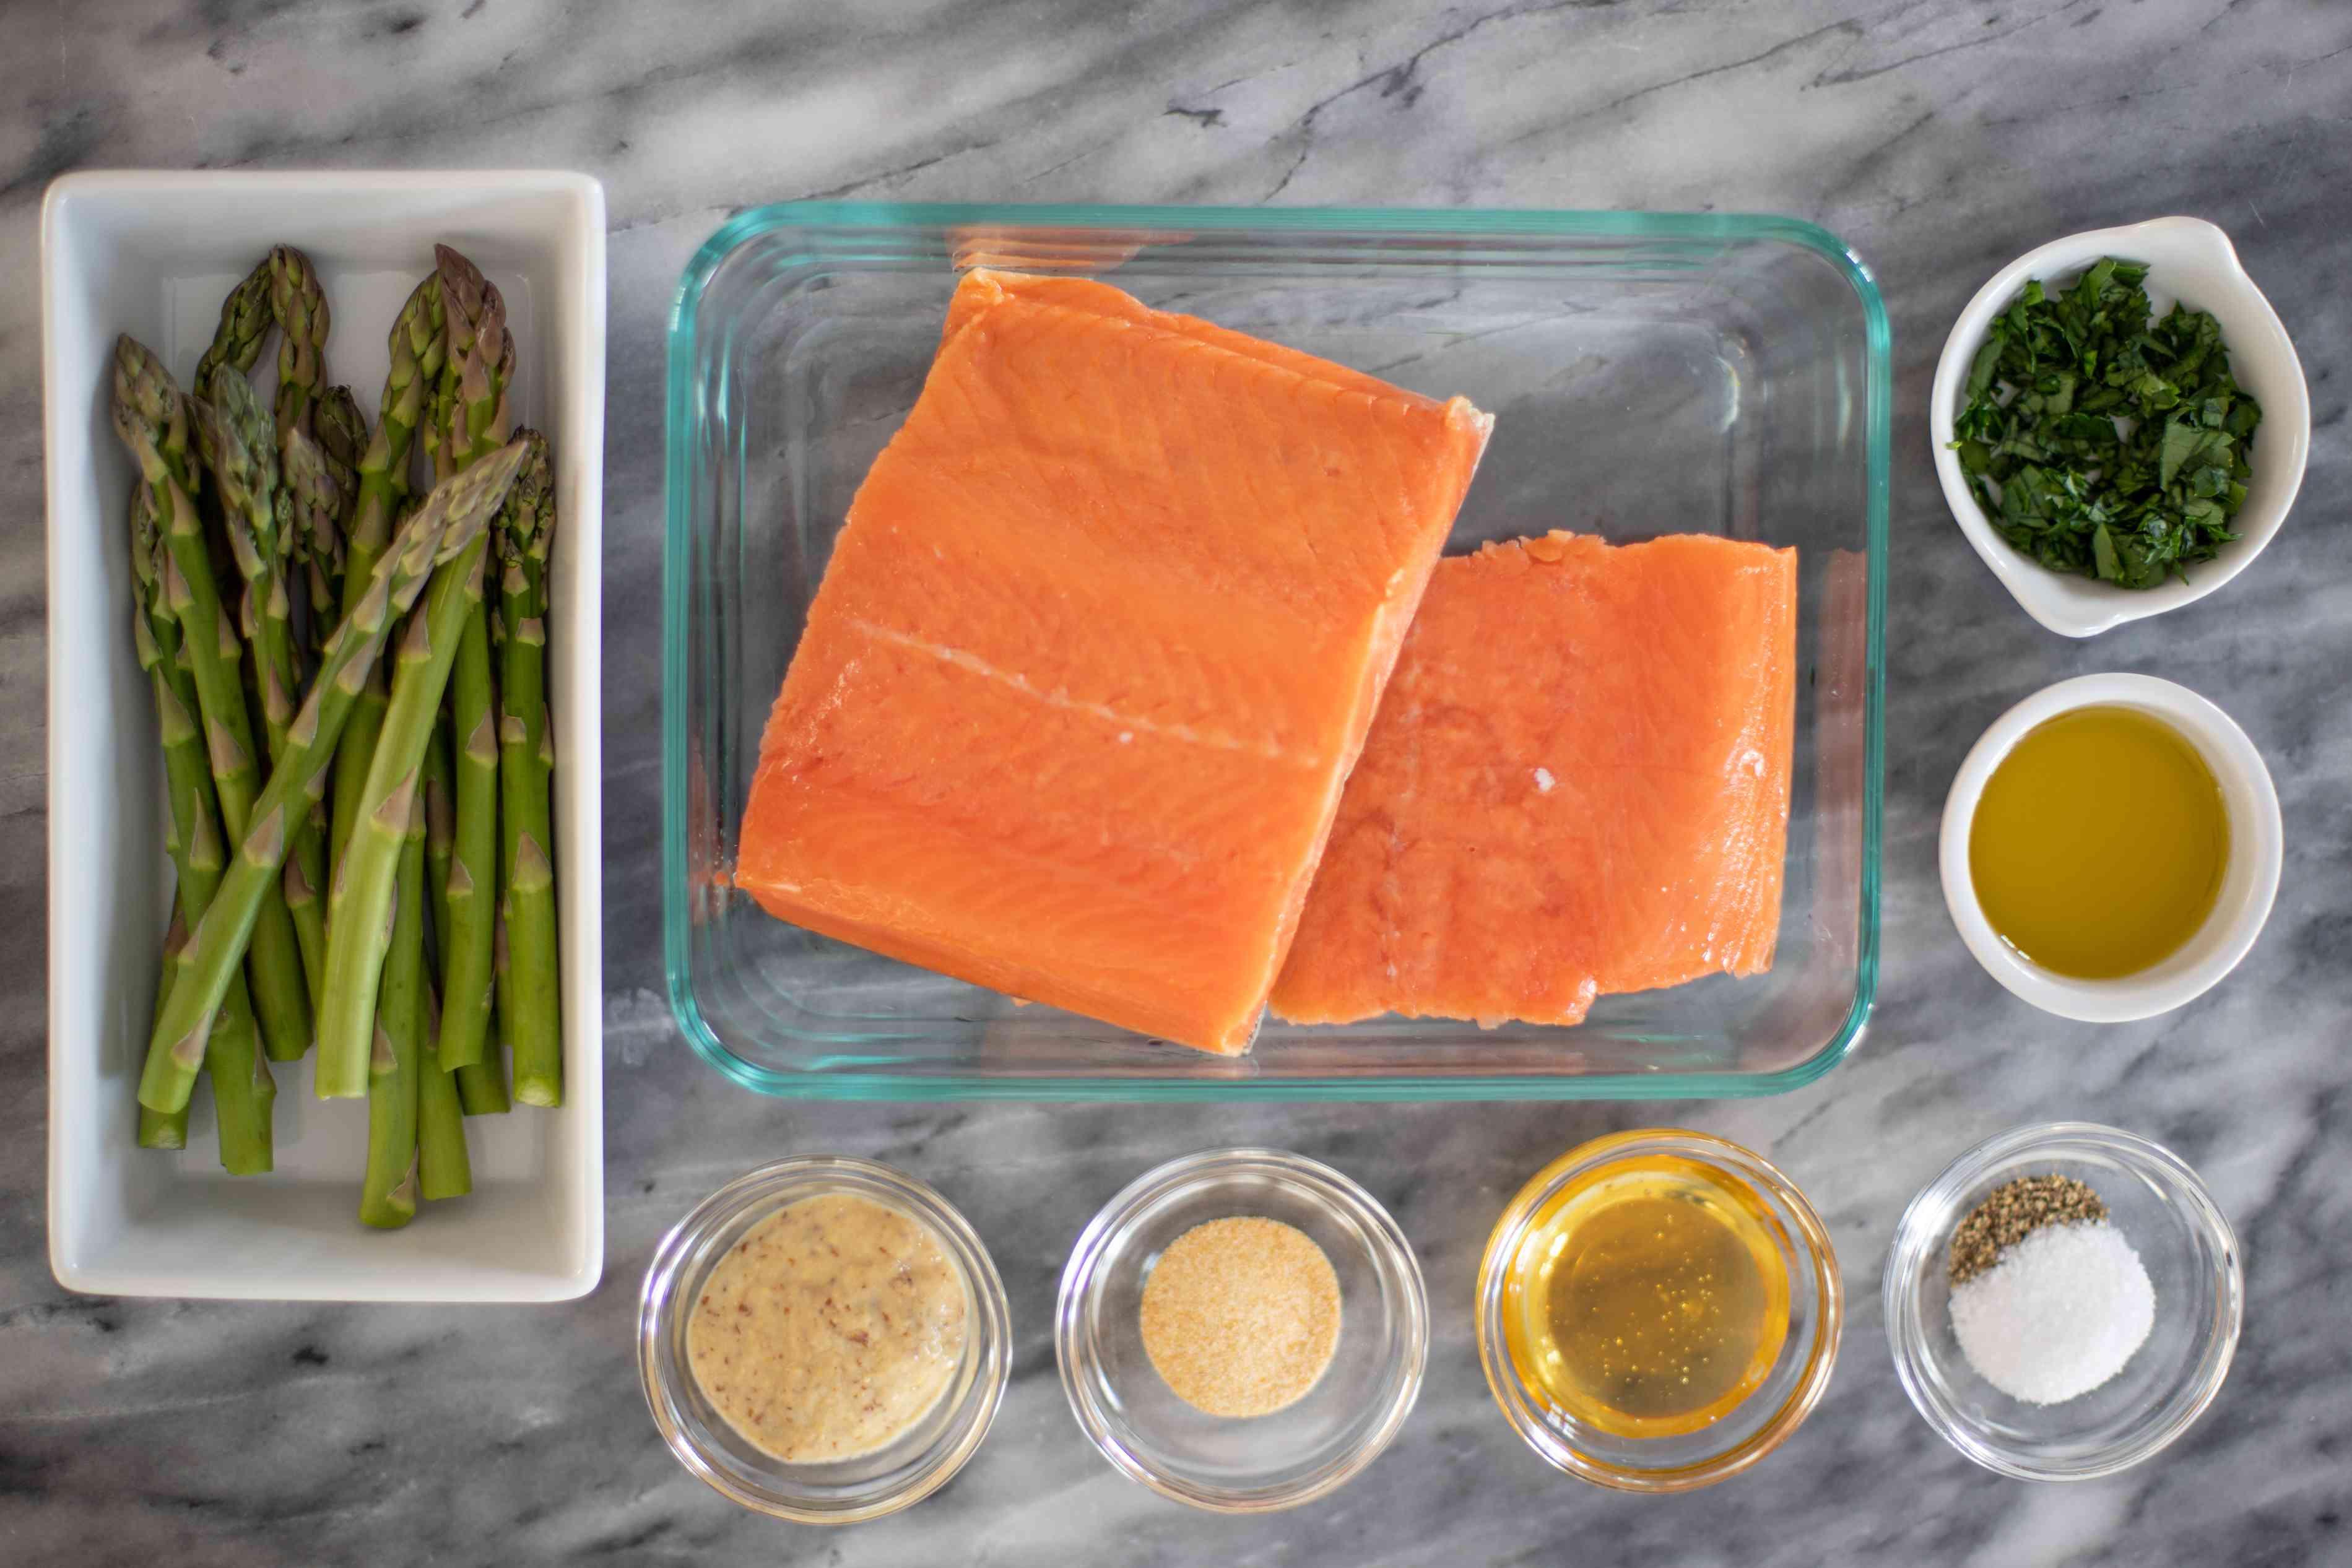 ingredients for air fryer salmon